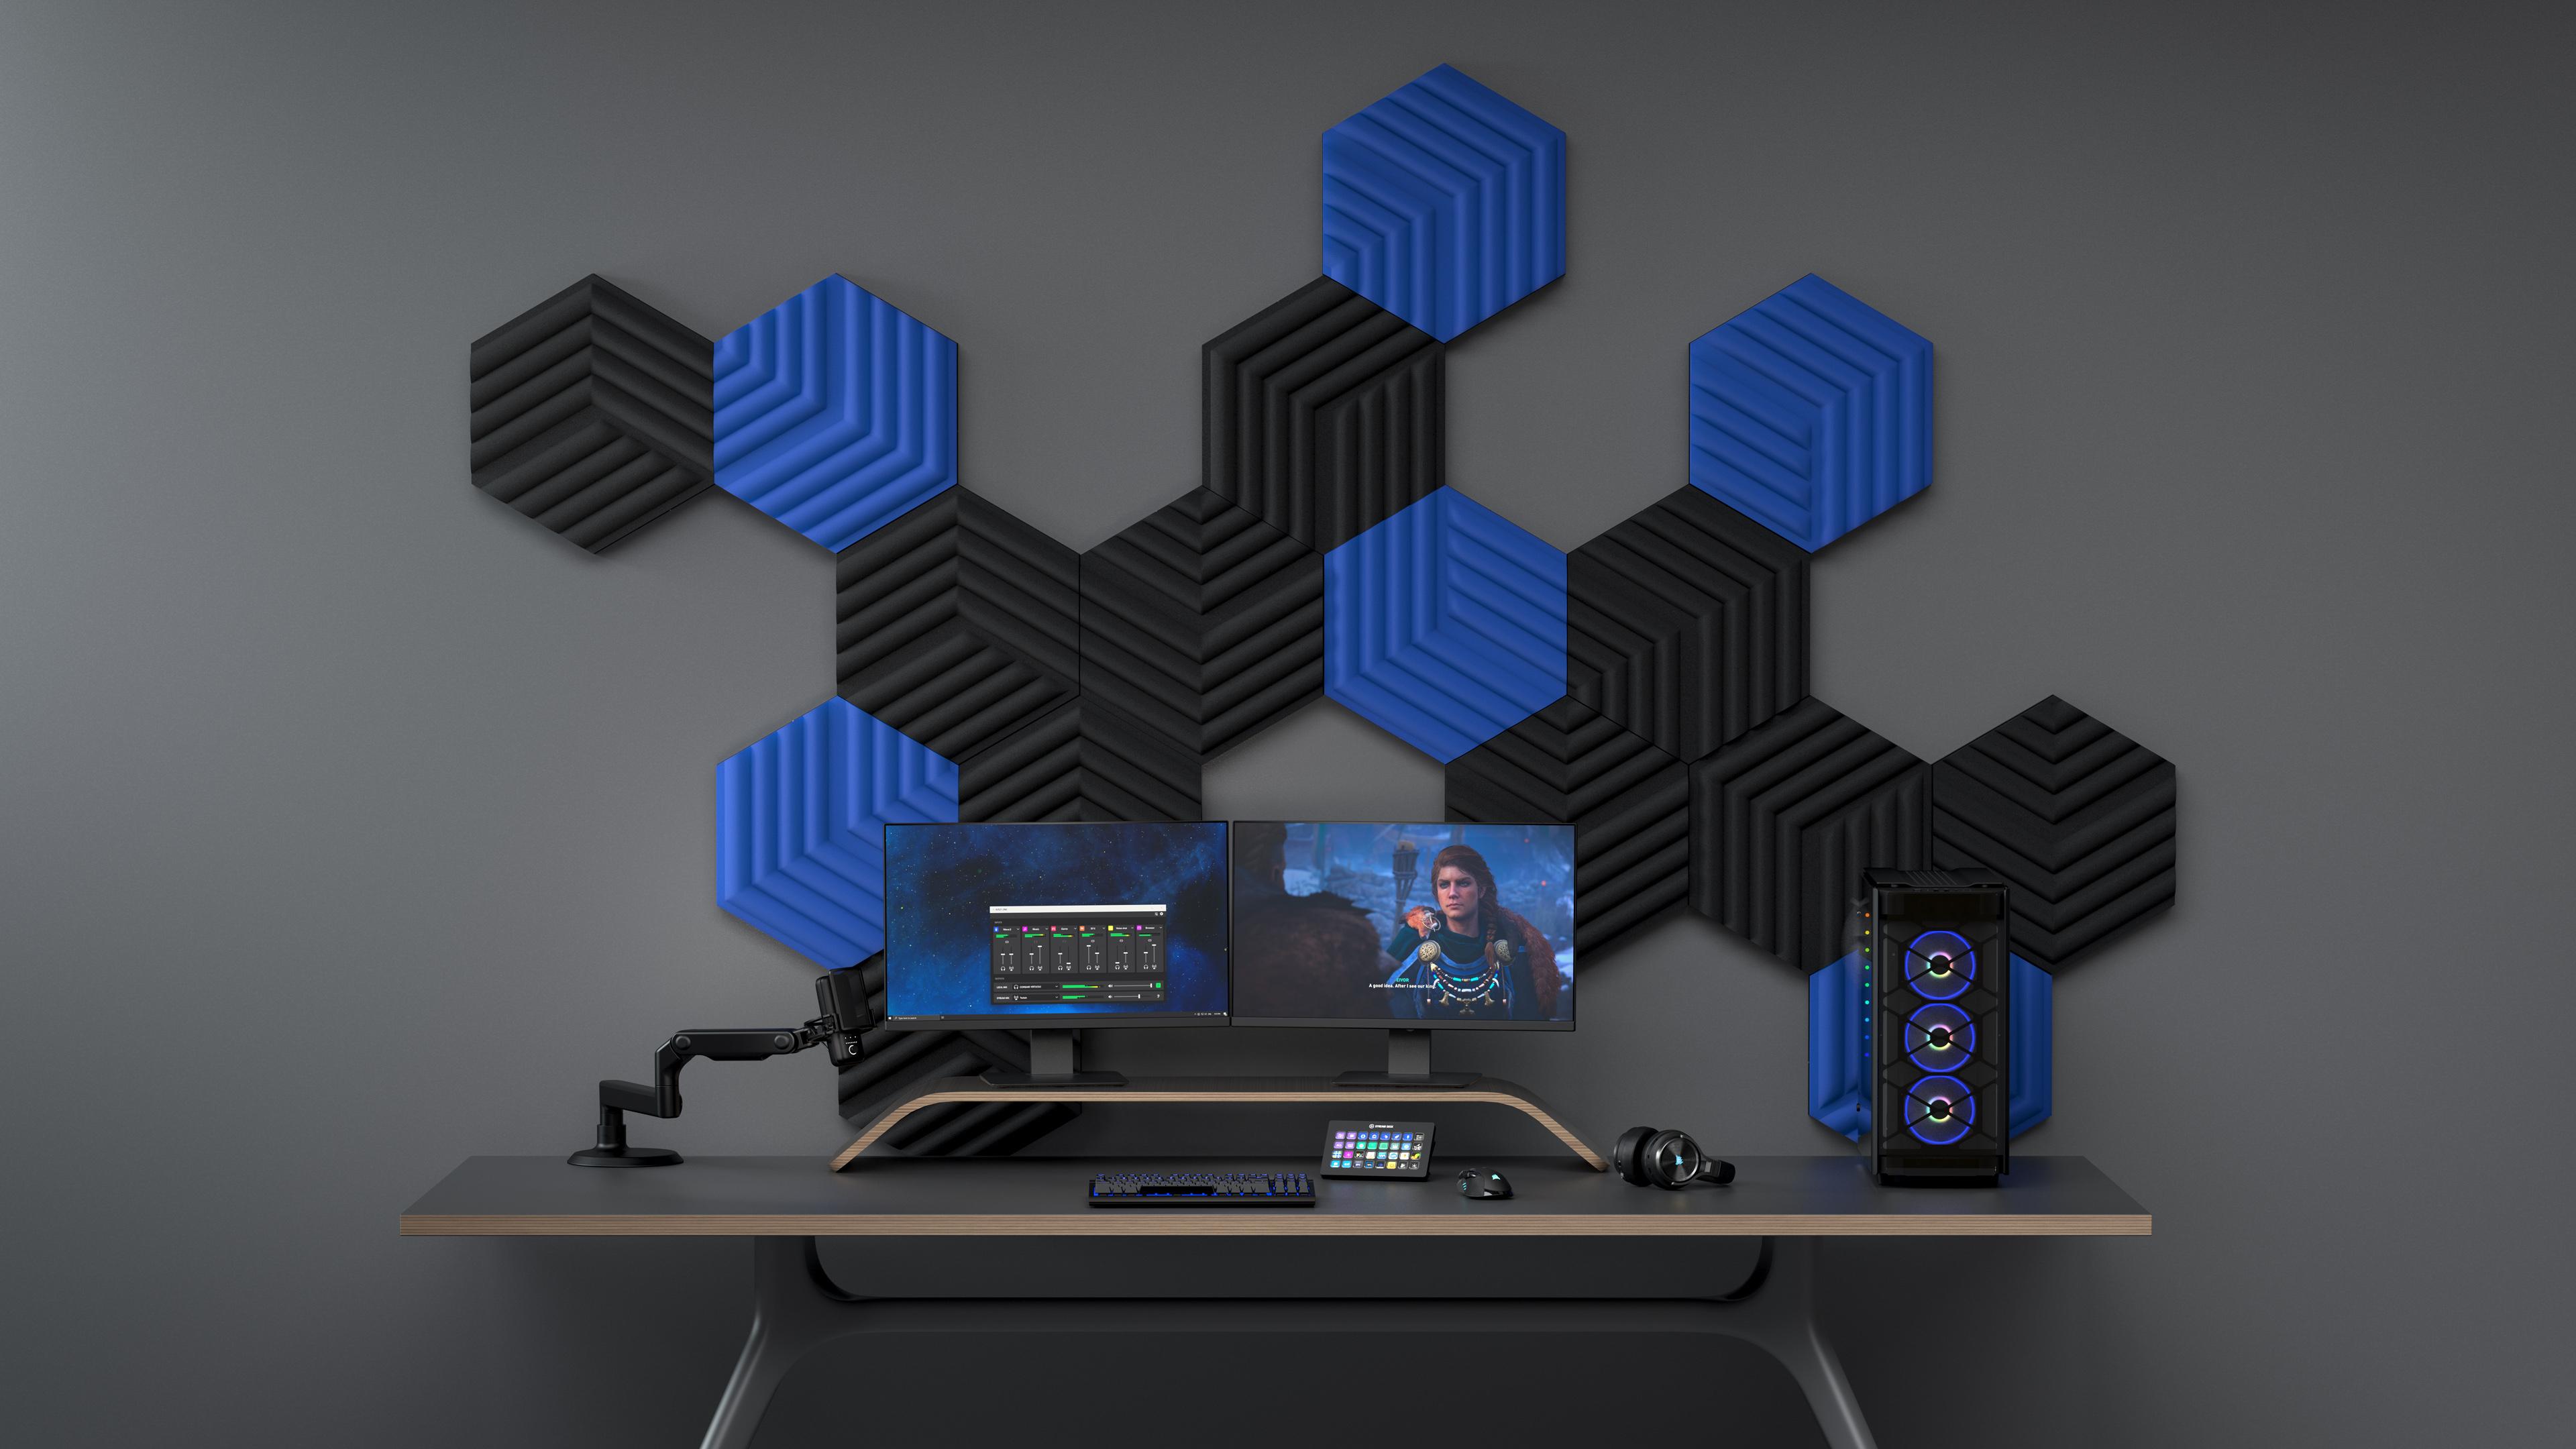 Elgato releases fancy acoustic foam panels for the discerning streamer